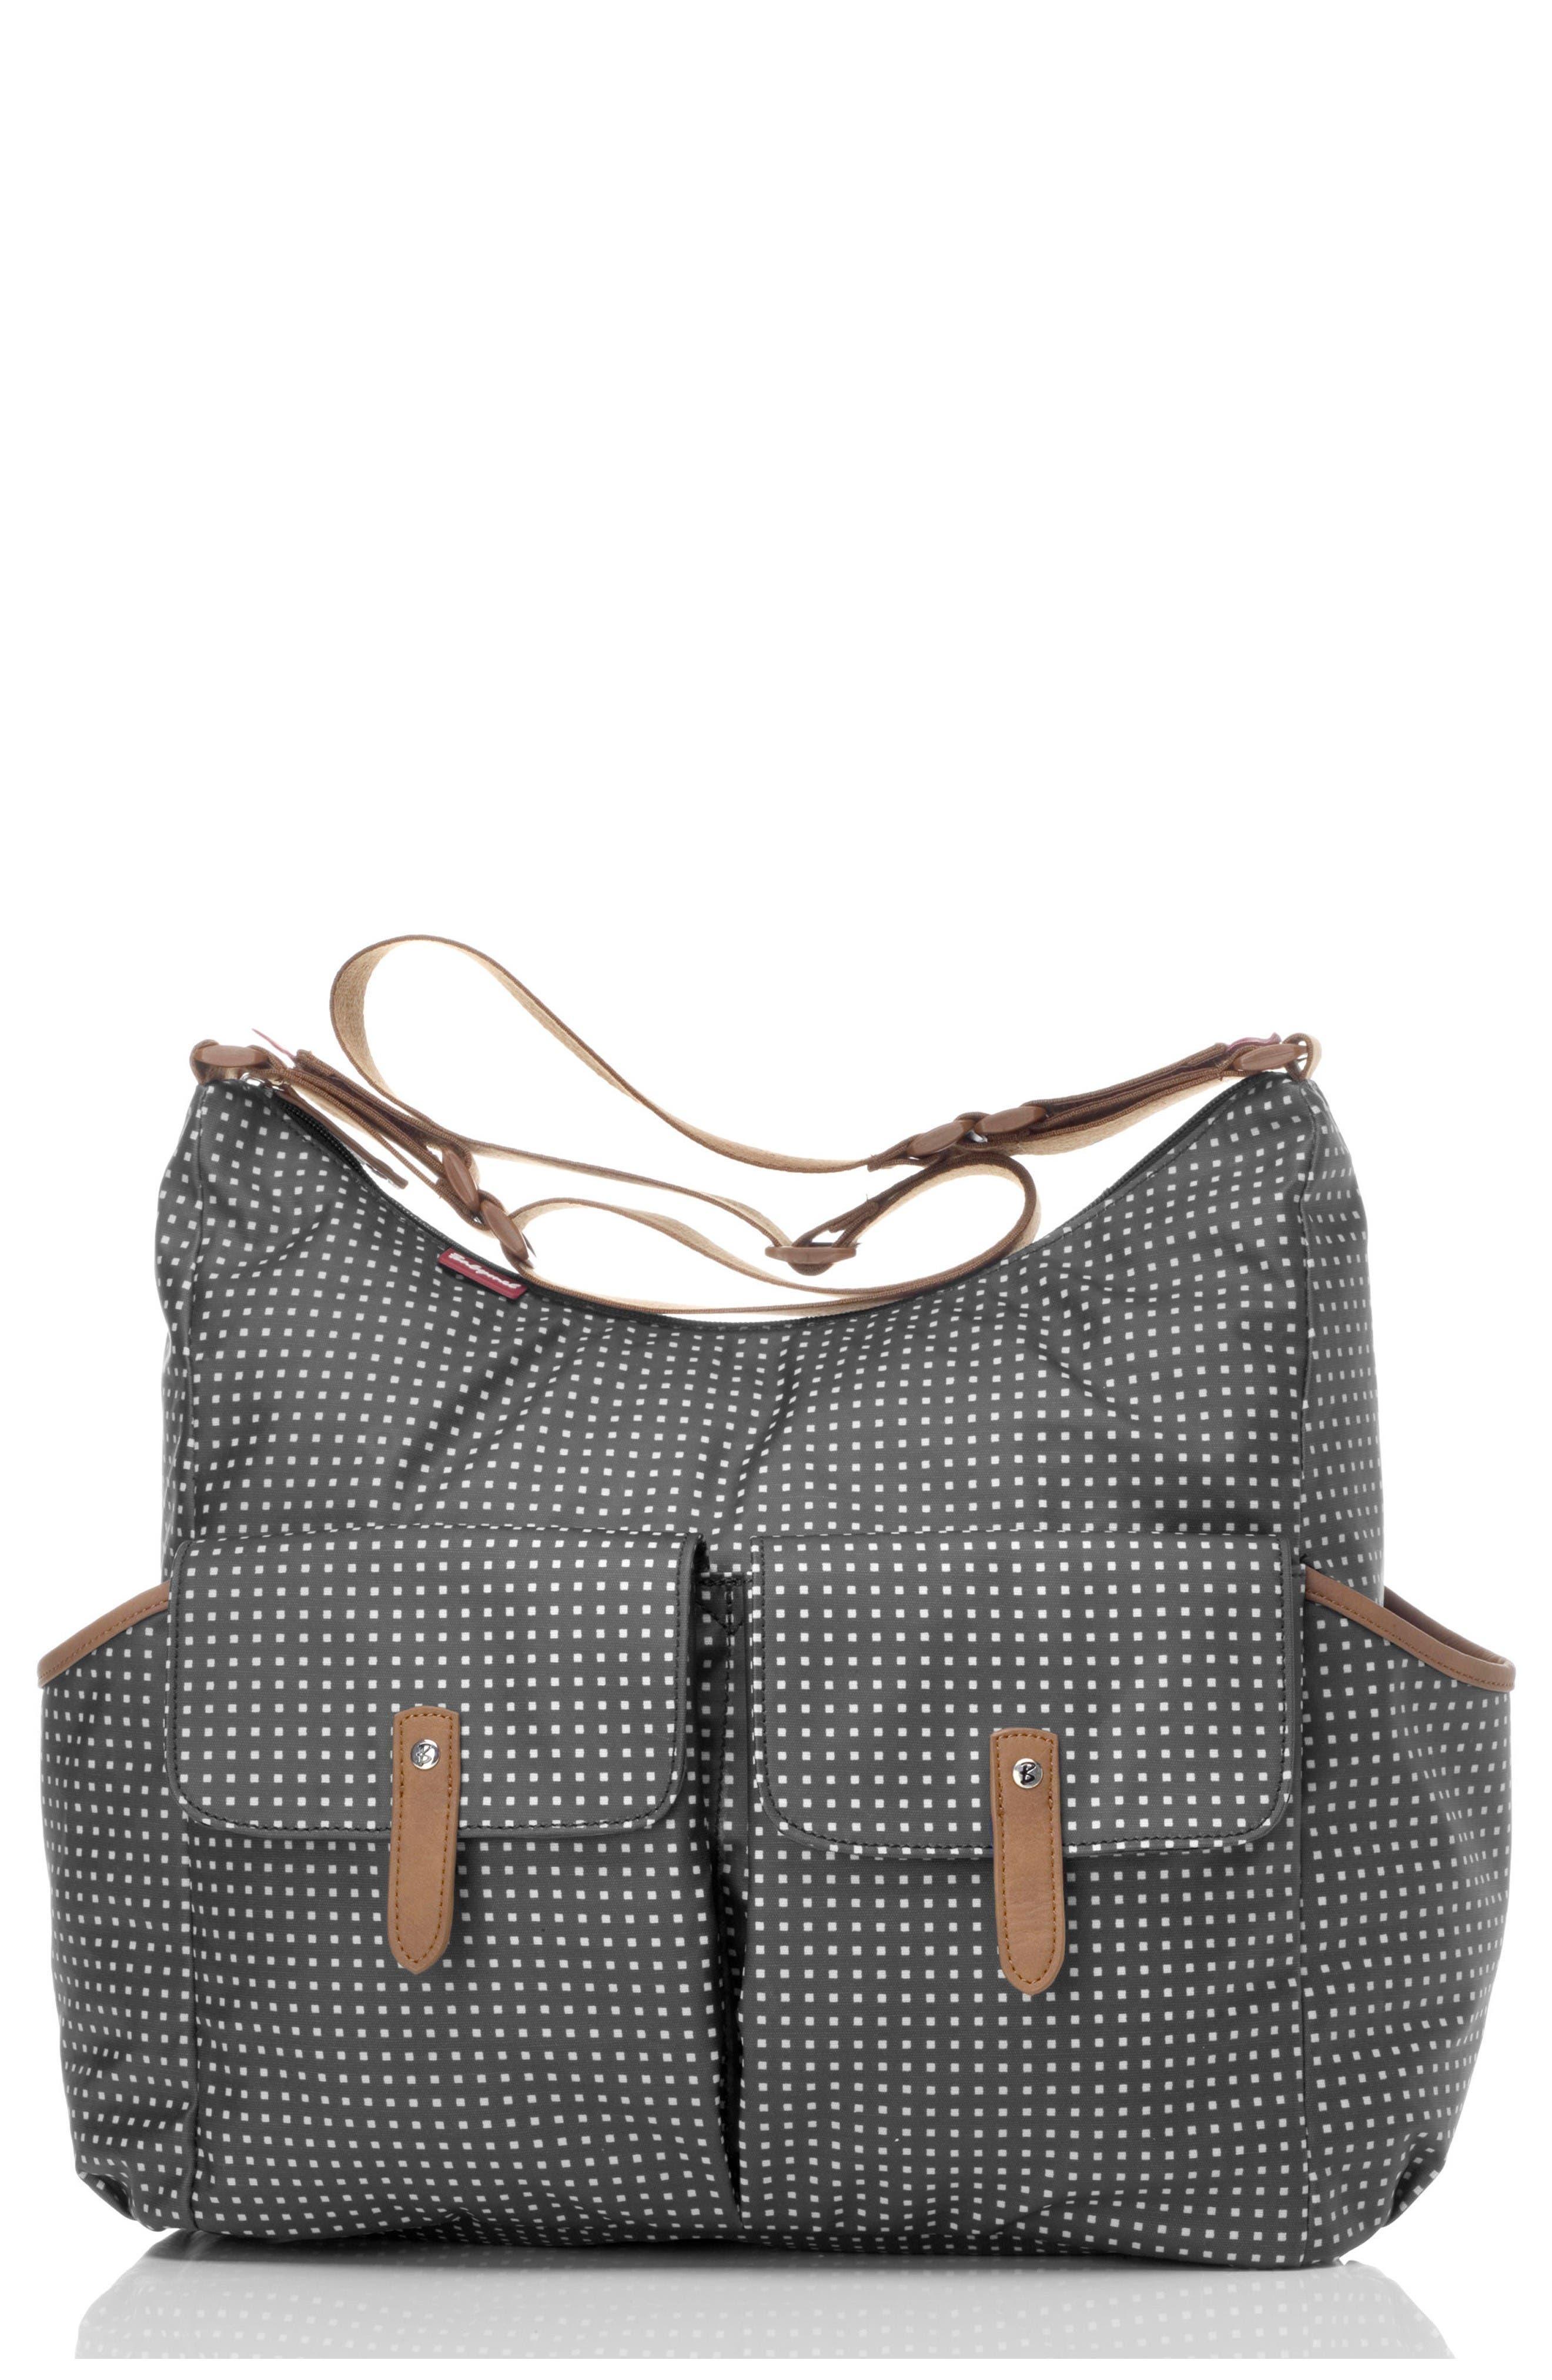 Babymel 'Frankie' Diaper Bag